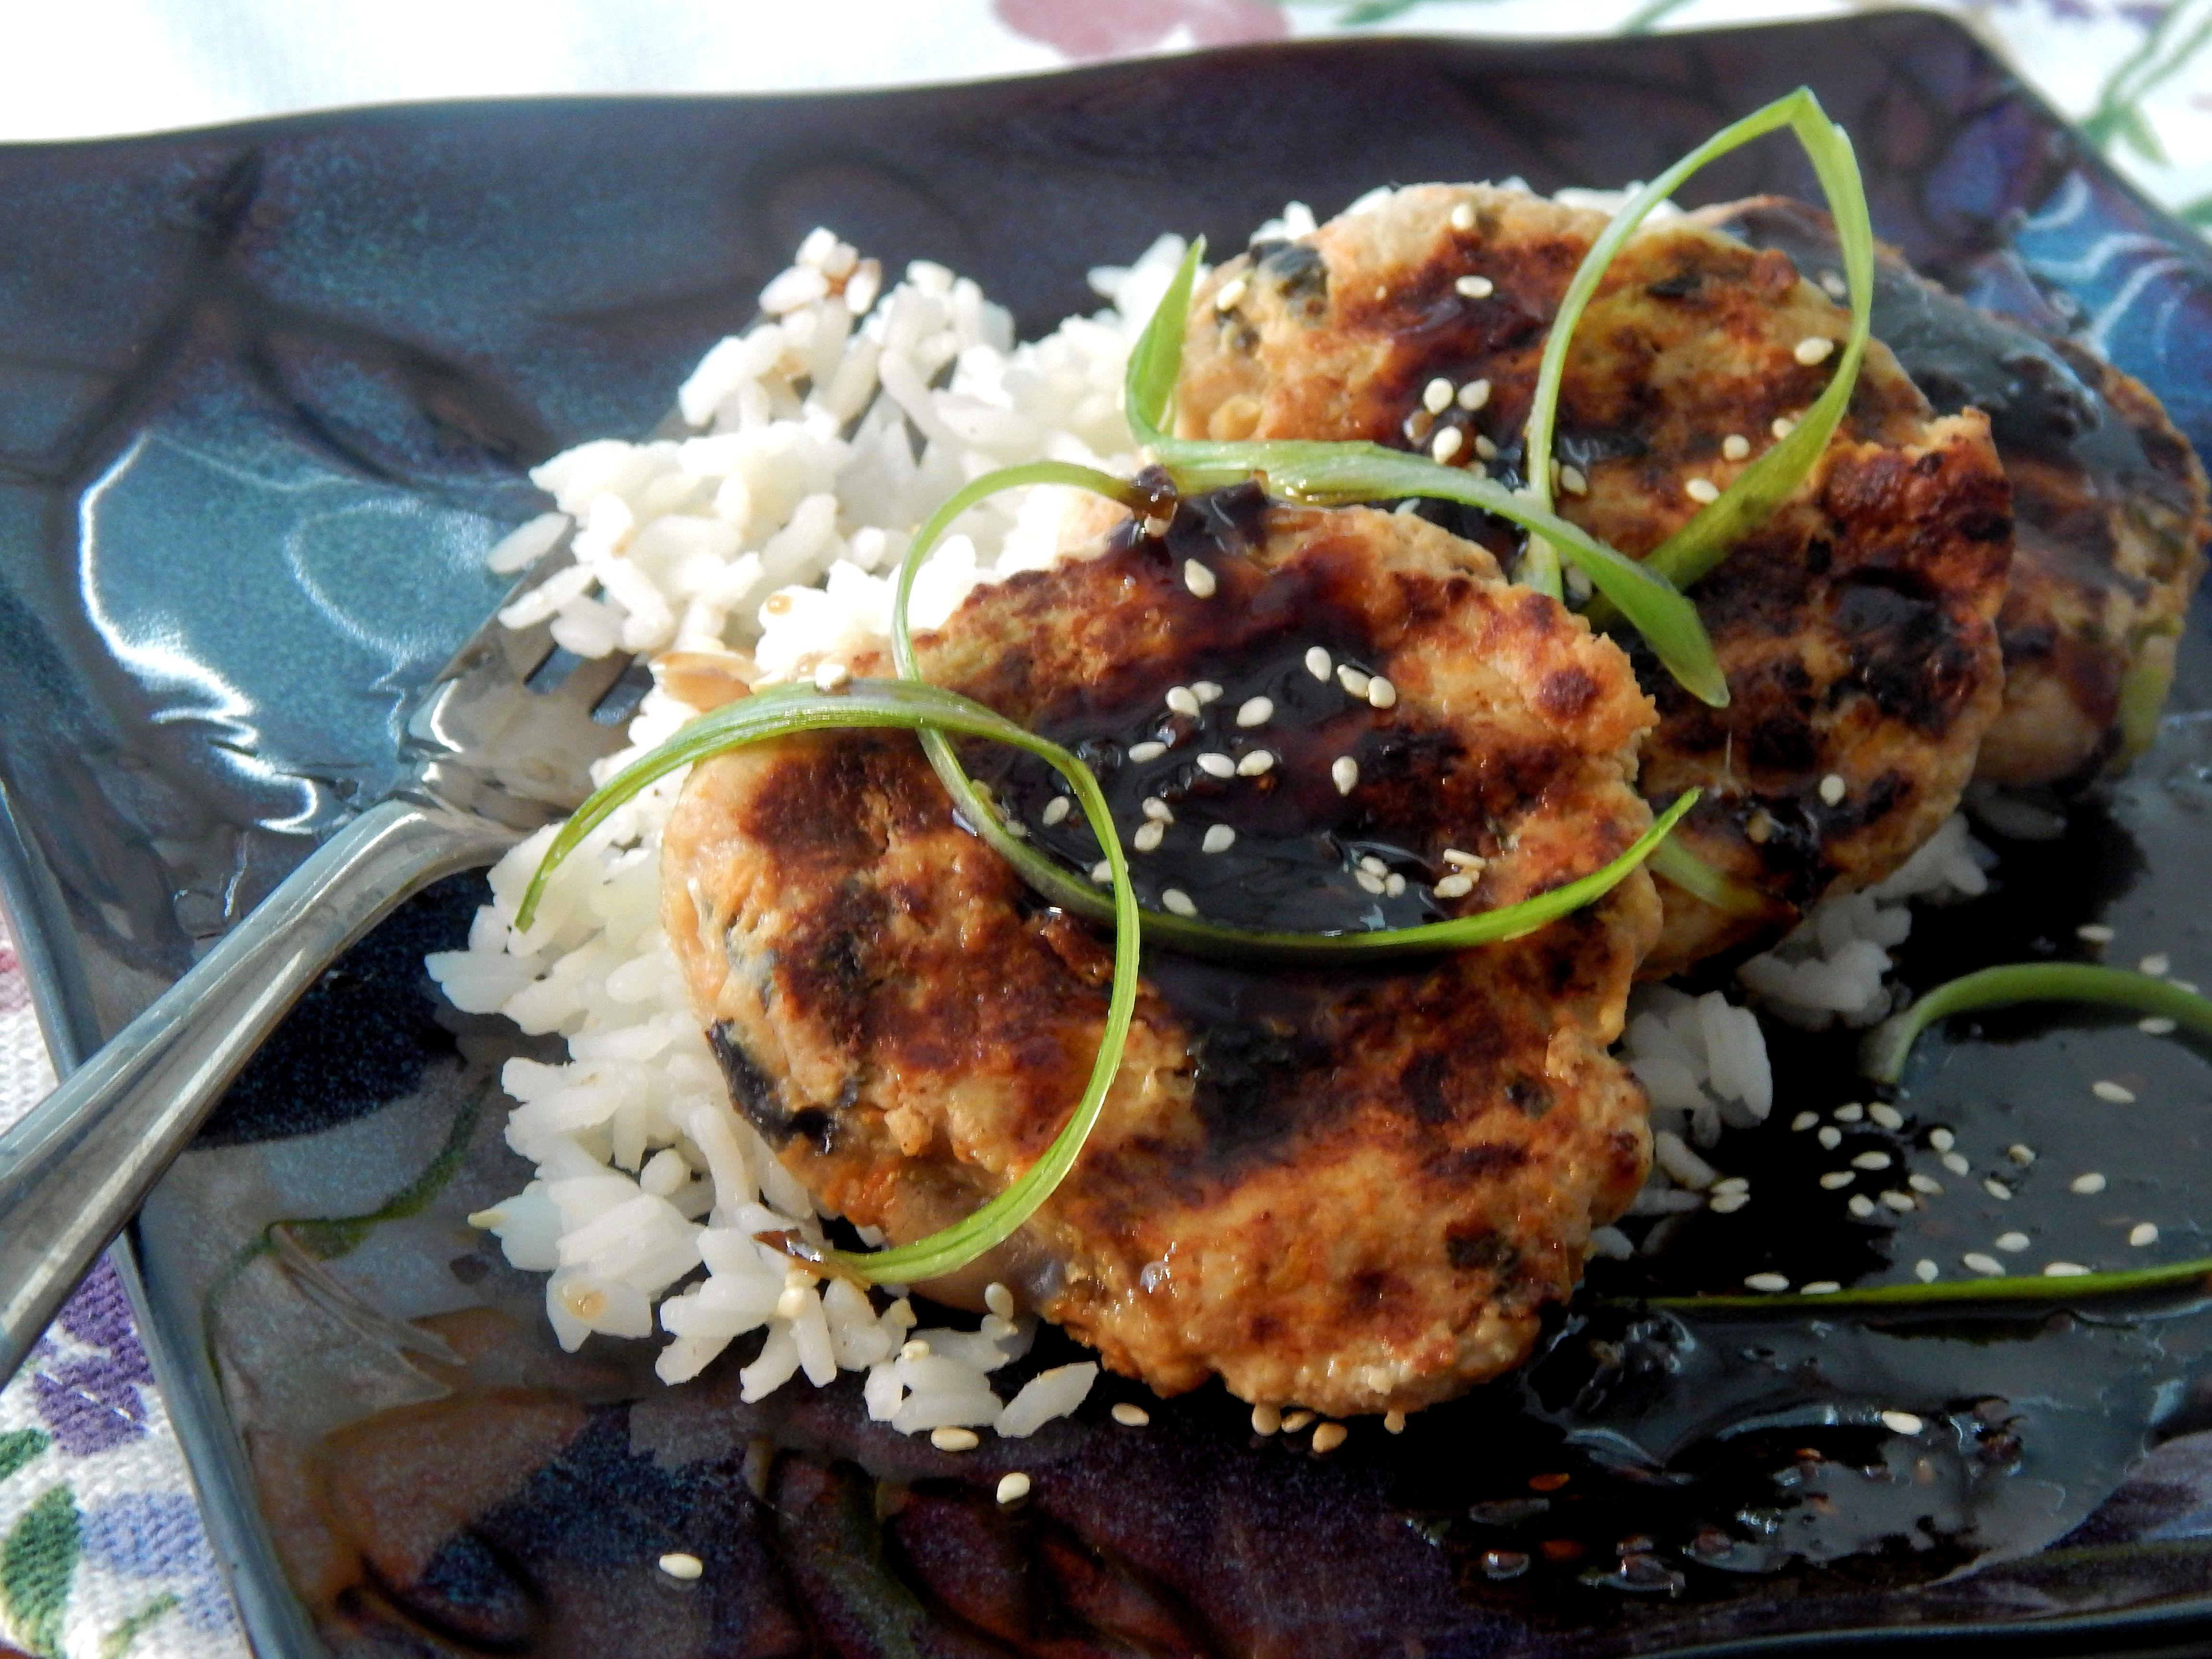 Tsukune (Japanese Chicken Meatballs) garywhinton